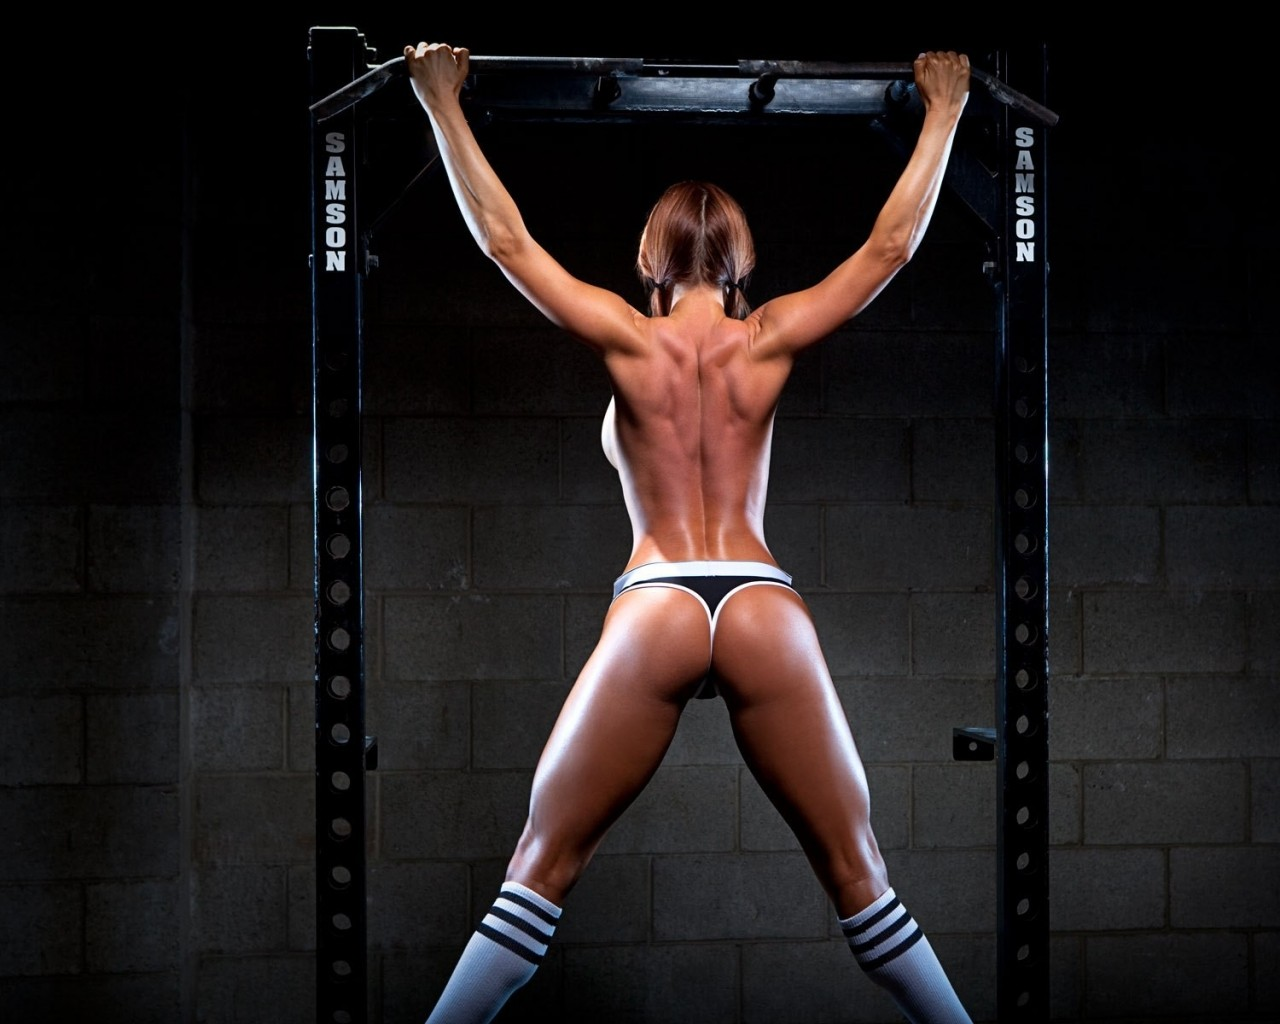 back_skinny_ass_fitness_model_working_out_model_women-342071.jpg